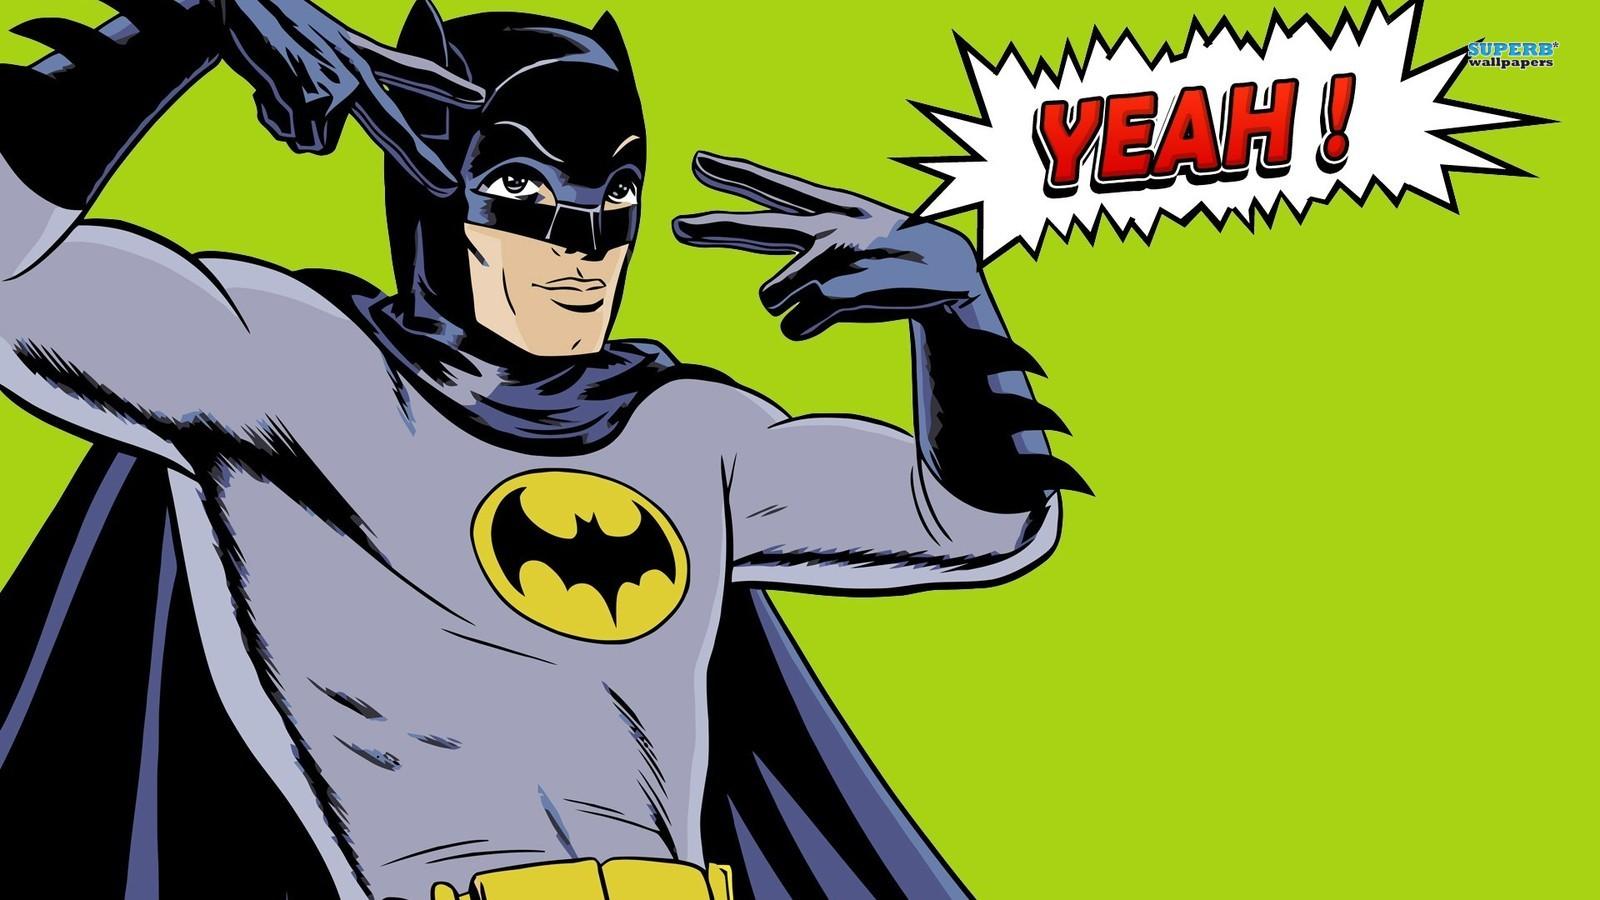 Gangsta-Batman-cartoons-38676745-1600-900.jpg